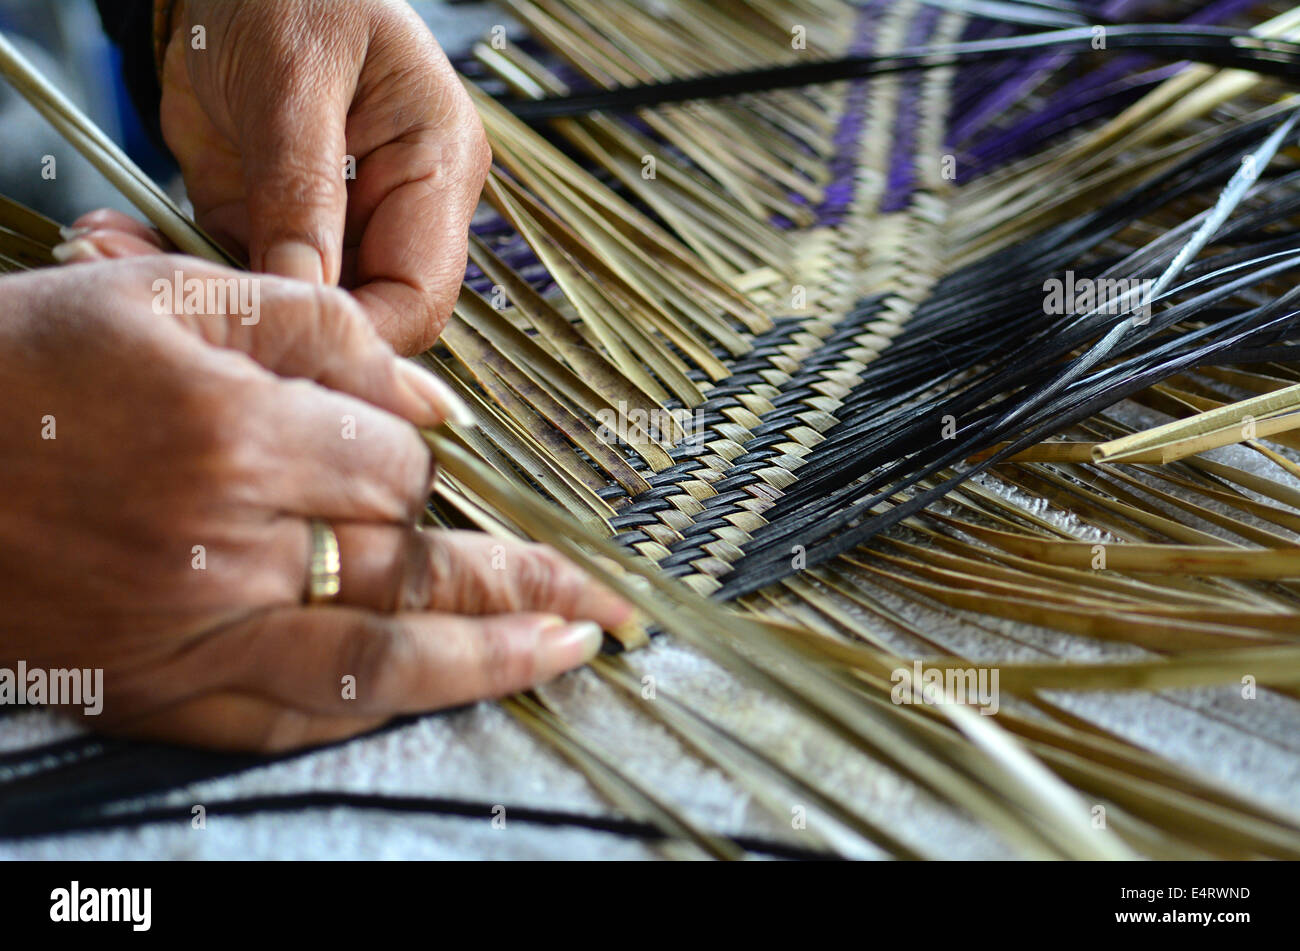 Hands of an old Maori woman weaving a traditional Maori woven artwork. - Stock Image